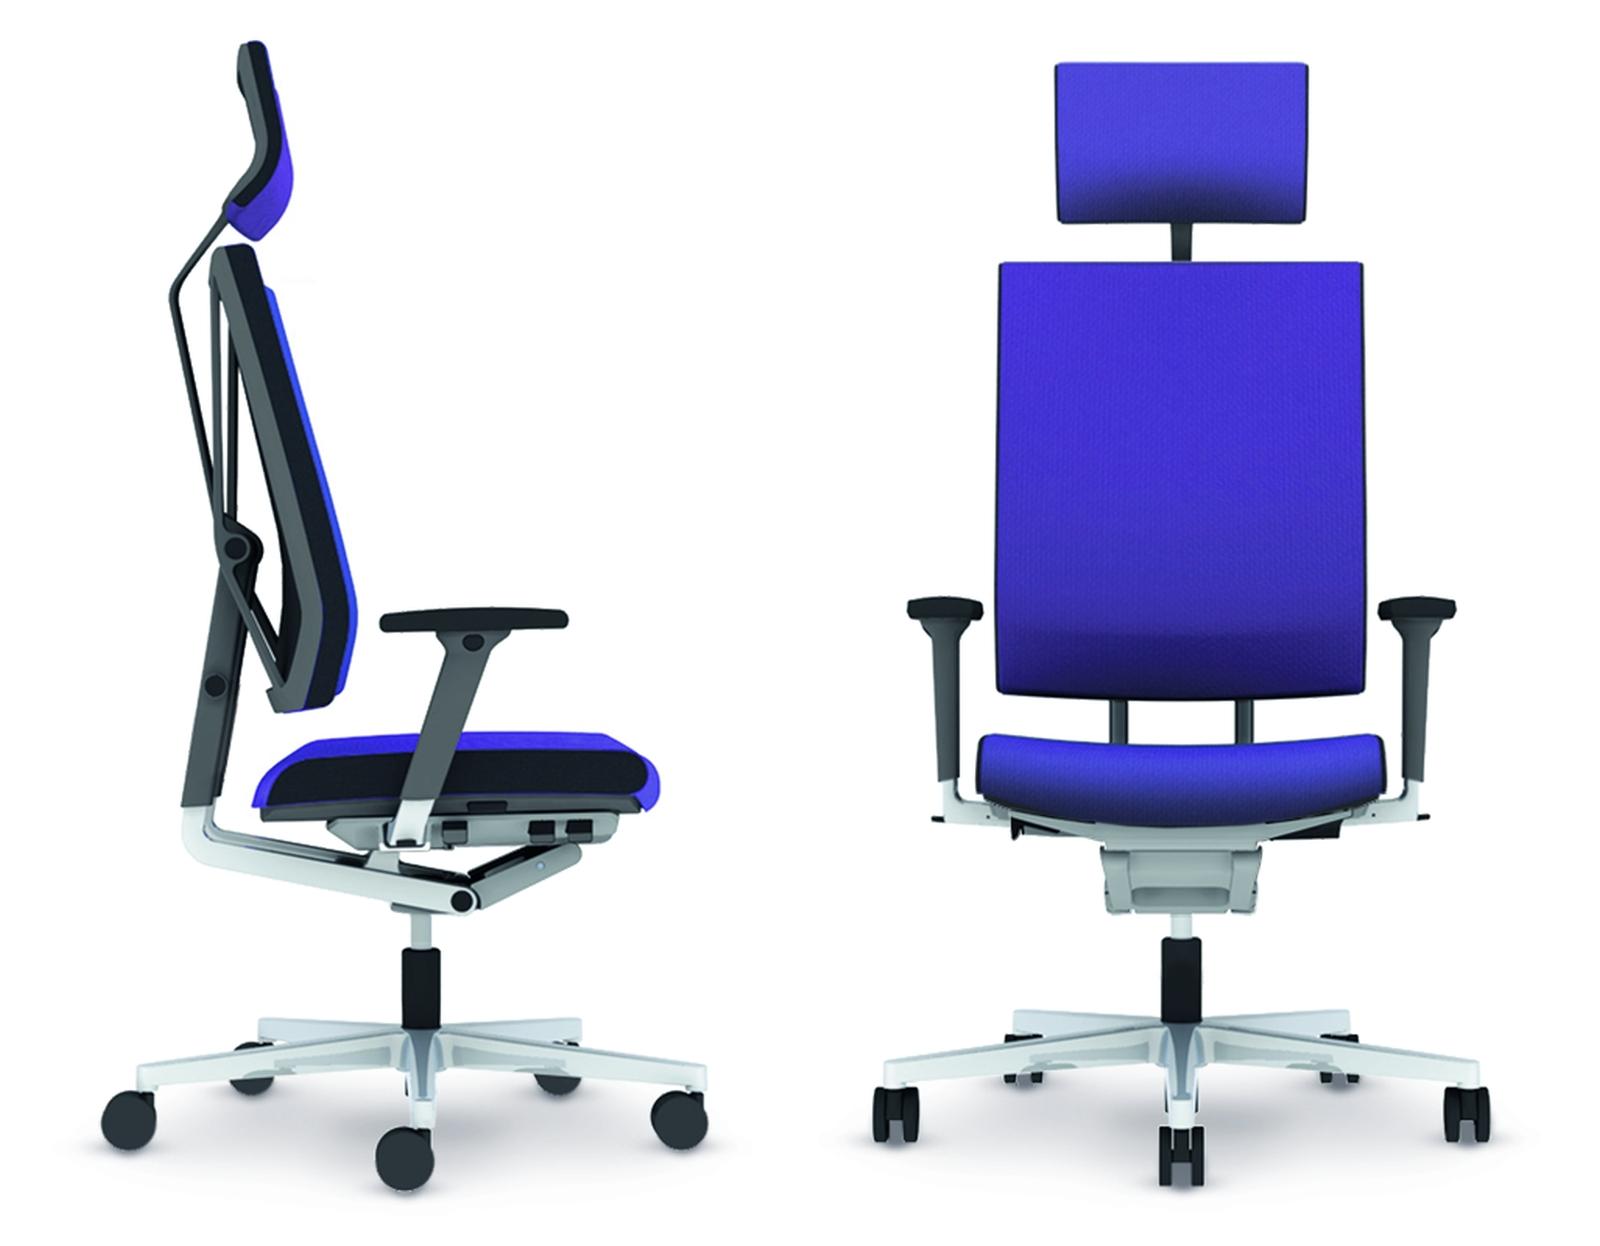 100 fauteuil de bureau ergonomique fauteuil chaises bureaux ikea faute - Fauteuil ikea bureau ...